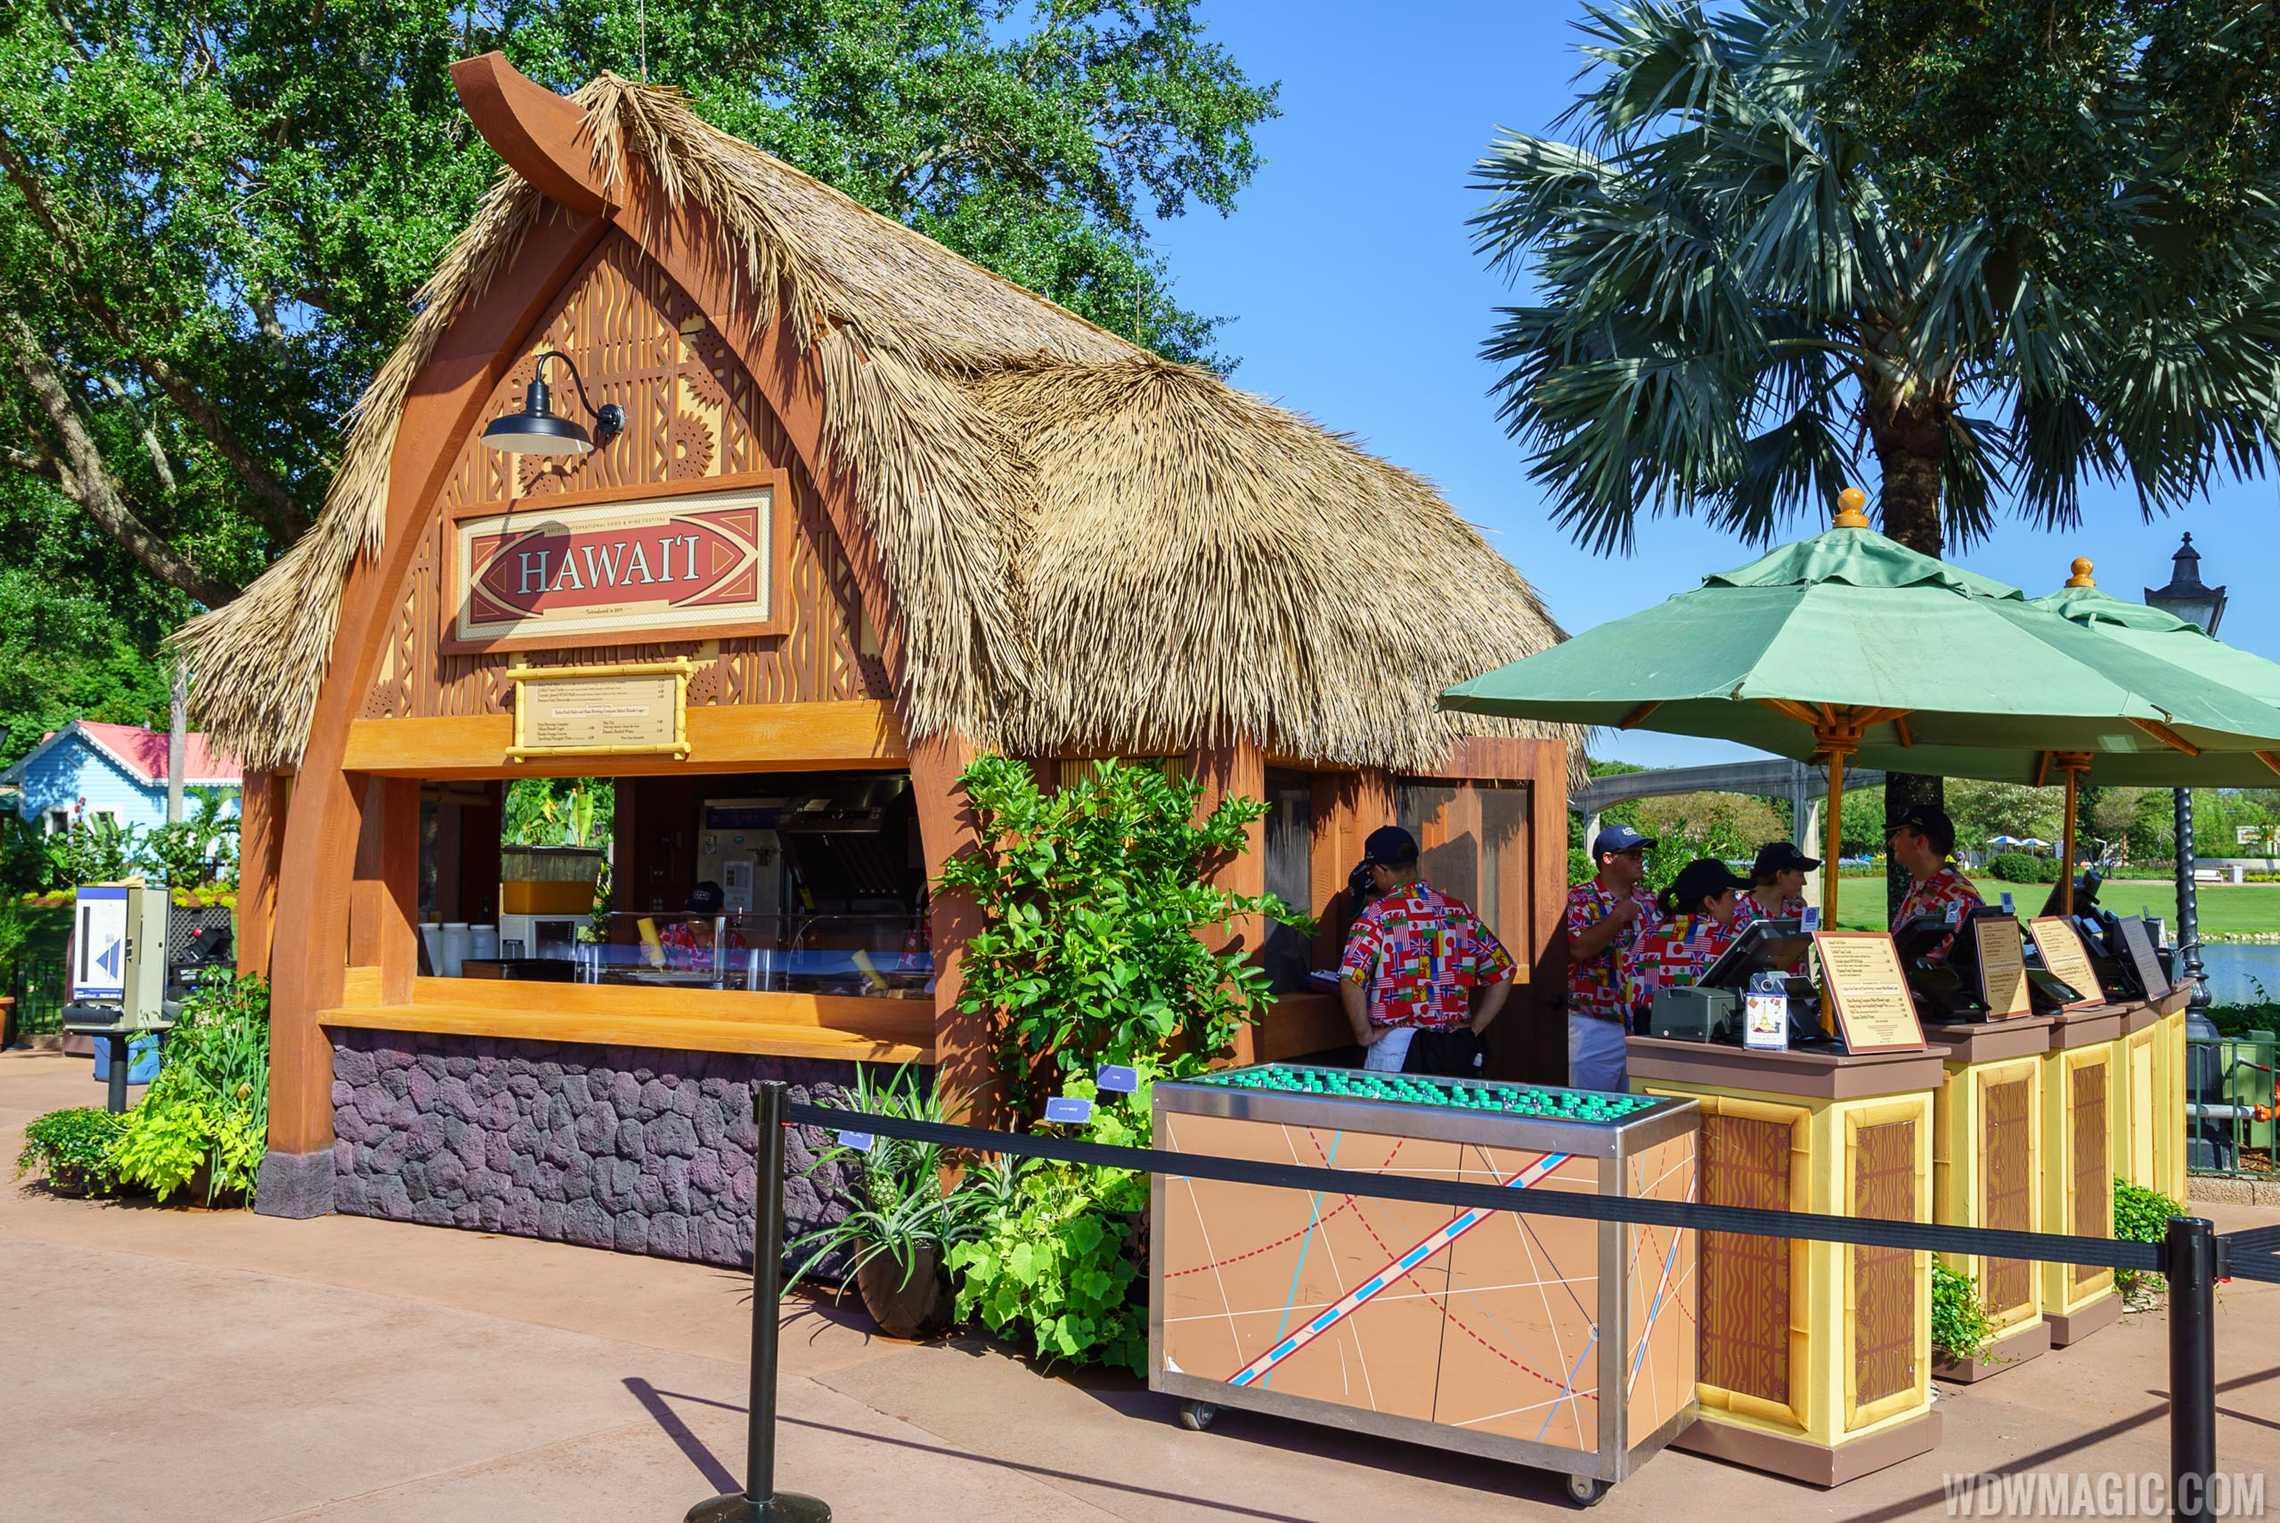 2017 Epcot Food and Wine Festival - Hawai'i marketplace kiosk